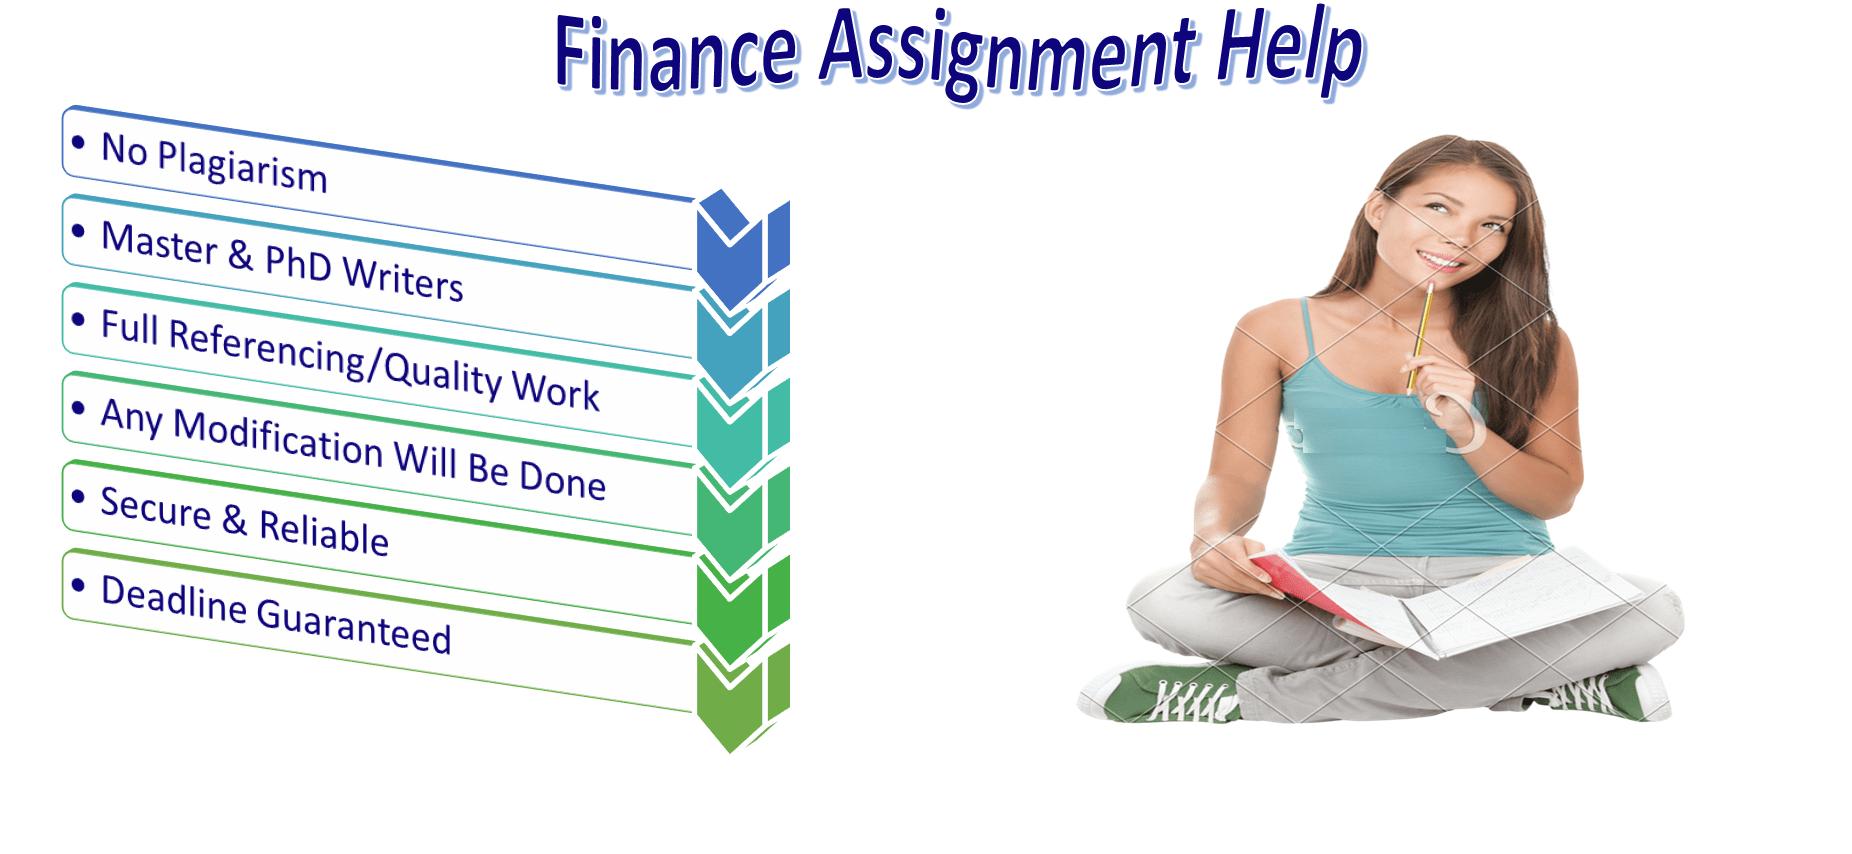 Finance Homework help online in usa main purpose of